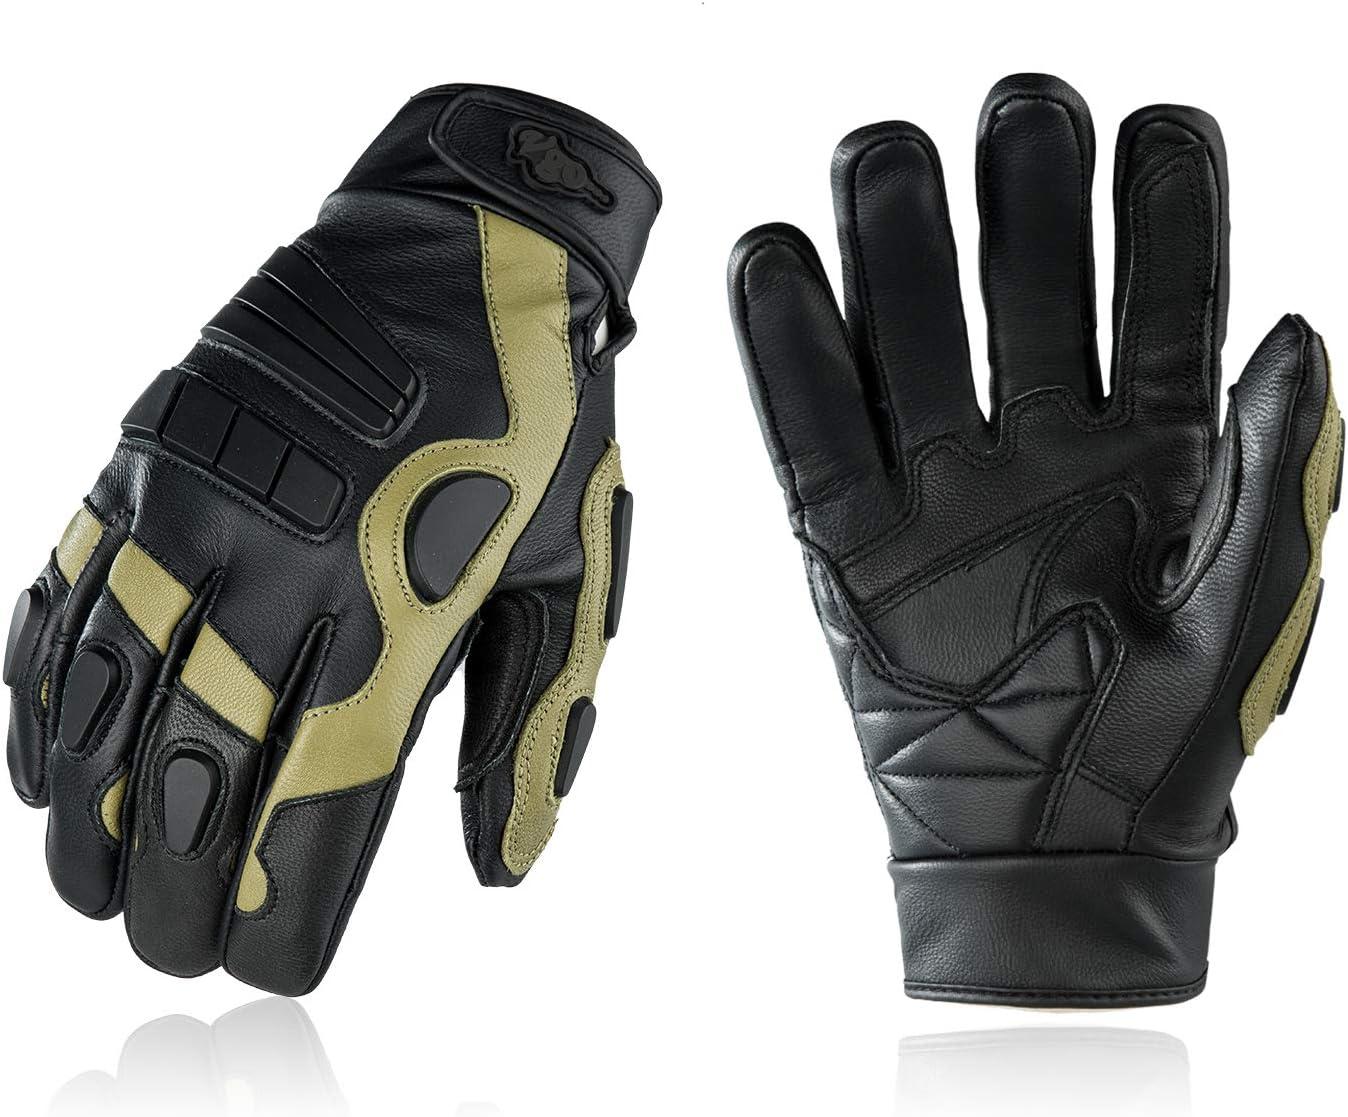 Work Gloves Black w//Green, GA5137F Water Repellent Motorbike Gloves Vgo 1 Pair Mens Genuine Goat Leather Motorcycle Gloves